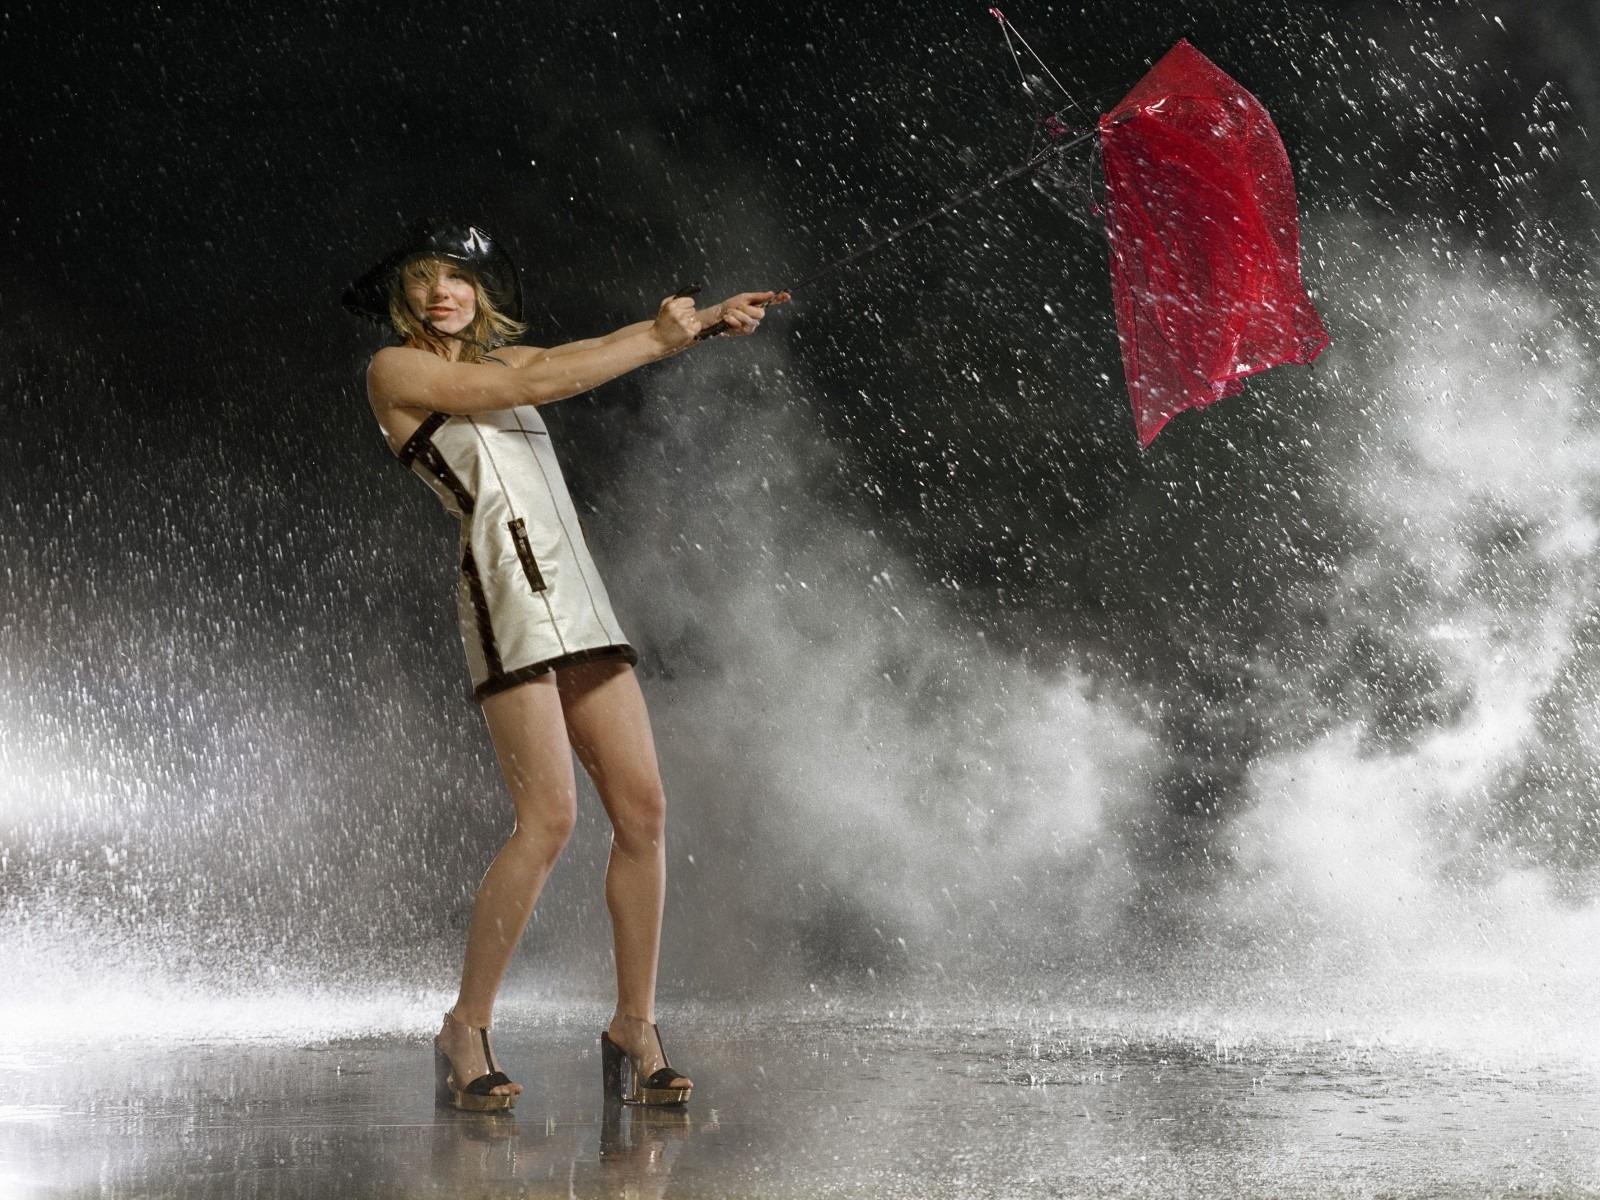 WongSeng HD Wallpapers: Sexy Girl In The Rain HD Wallpaper